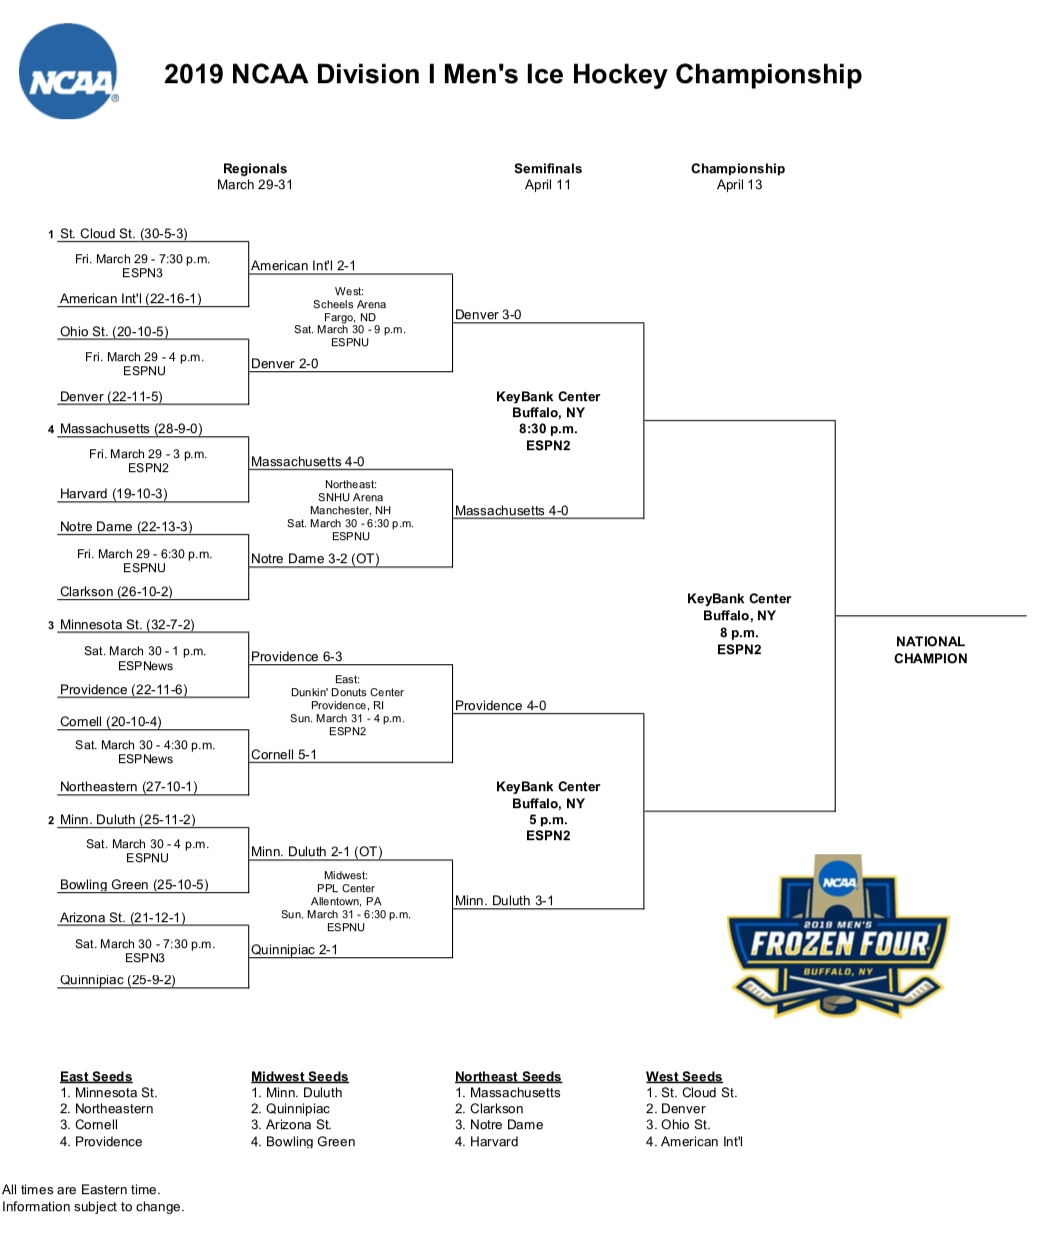 image regarding The Man in the Arena Printable named Frozen 4 bracket: Printable 2019 NCAA hockey event